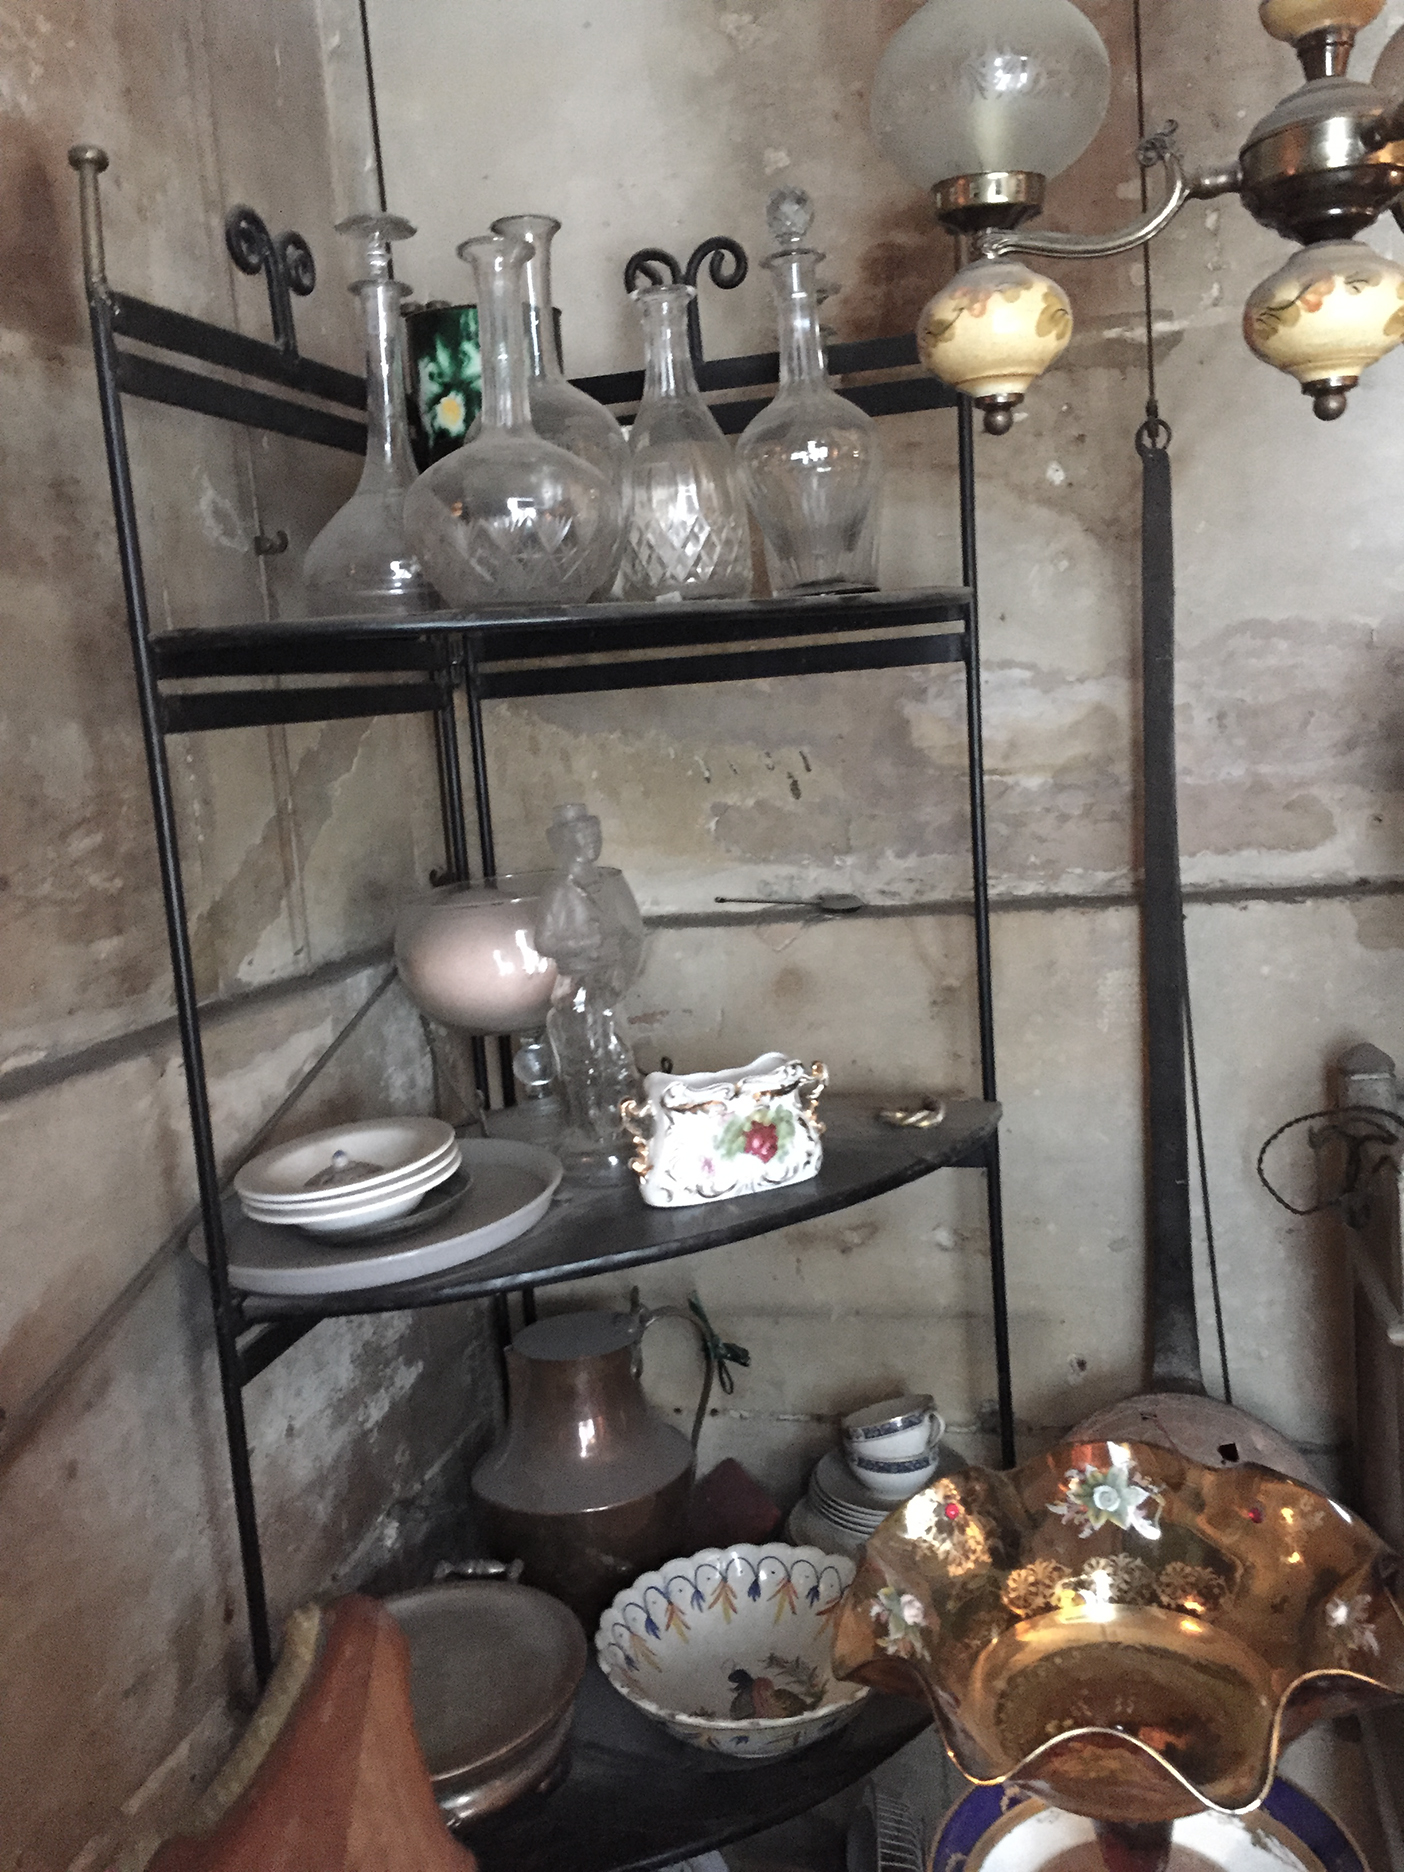 Antique decanters and, perhaps, a Quimper bowl.